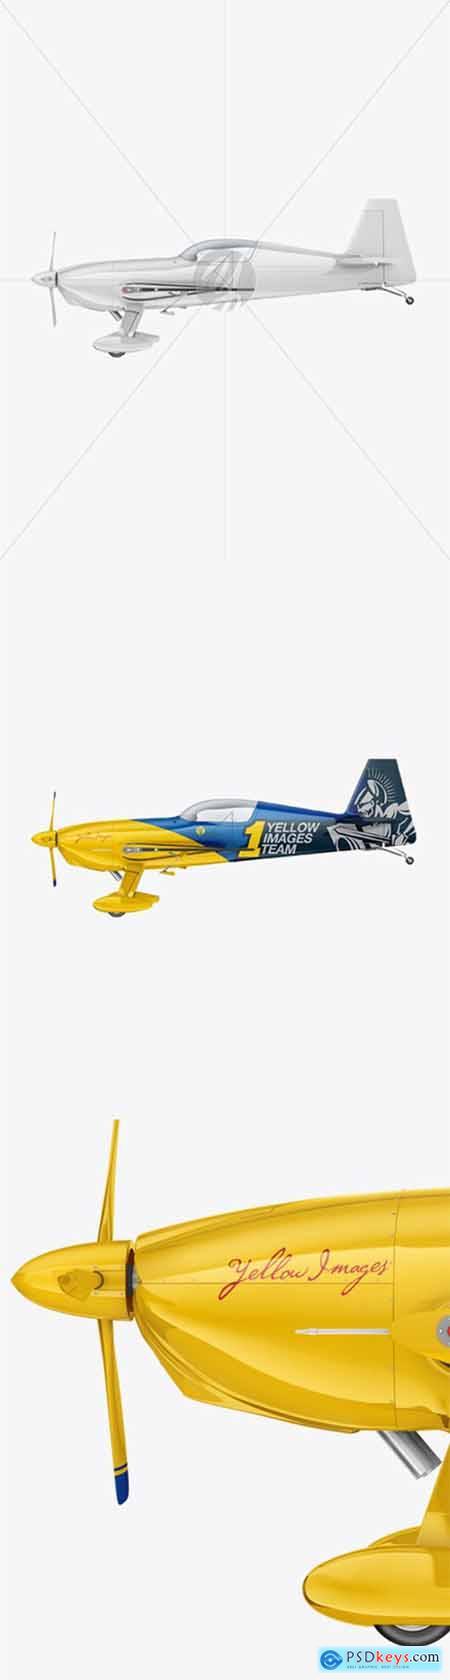 Sport Airplane Mockup - Side View 55702